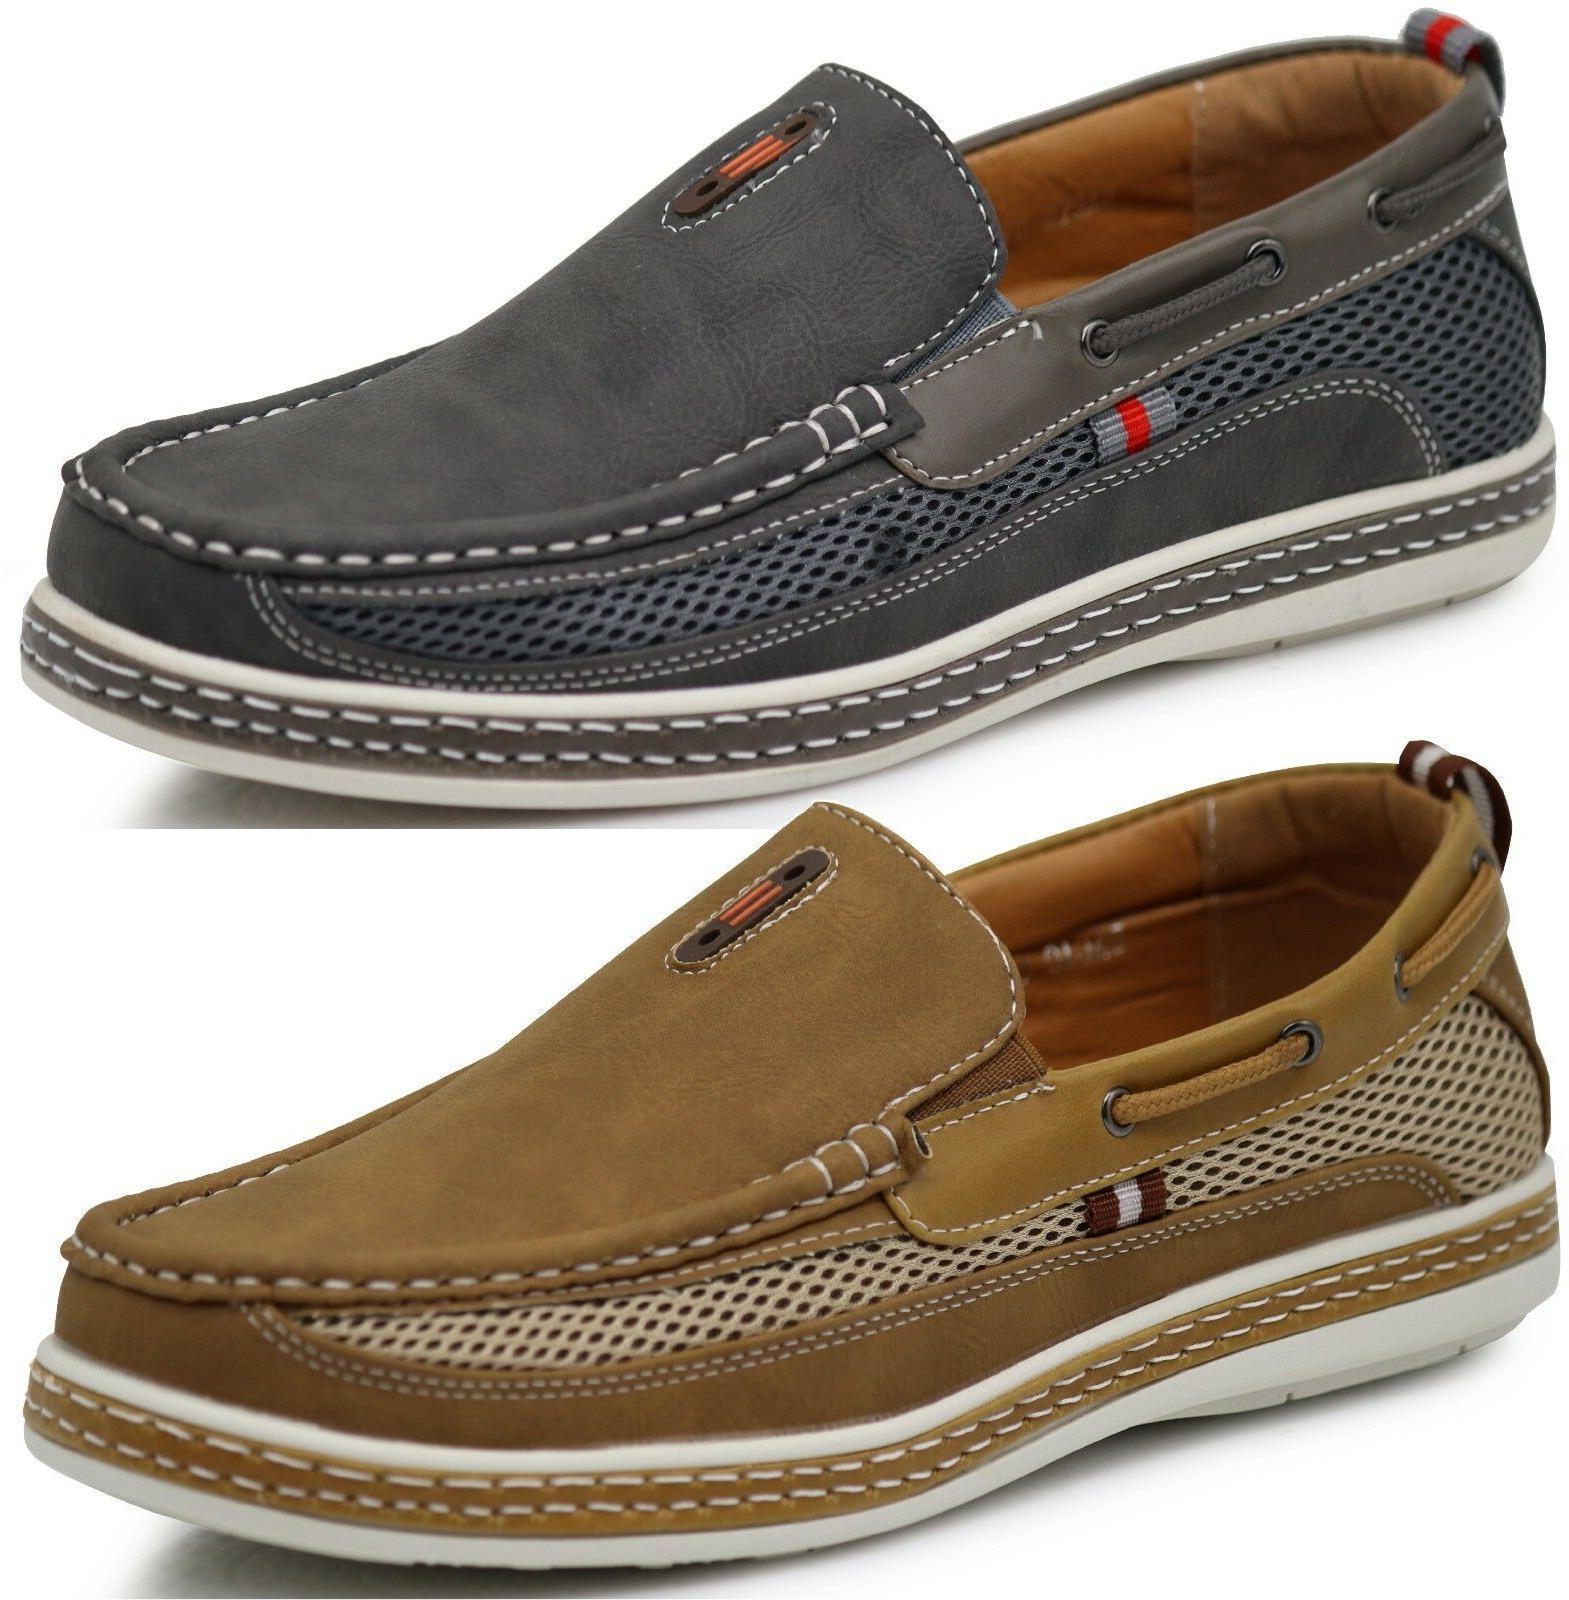 new men boat shoes driving moccasins slip